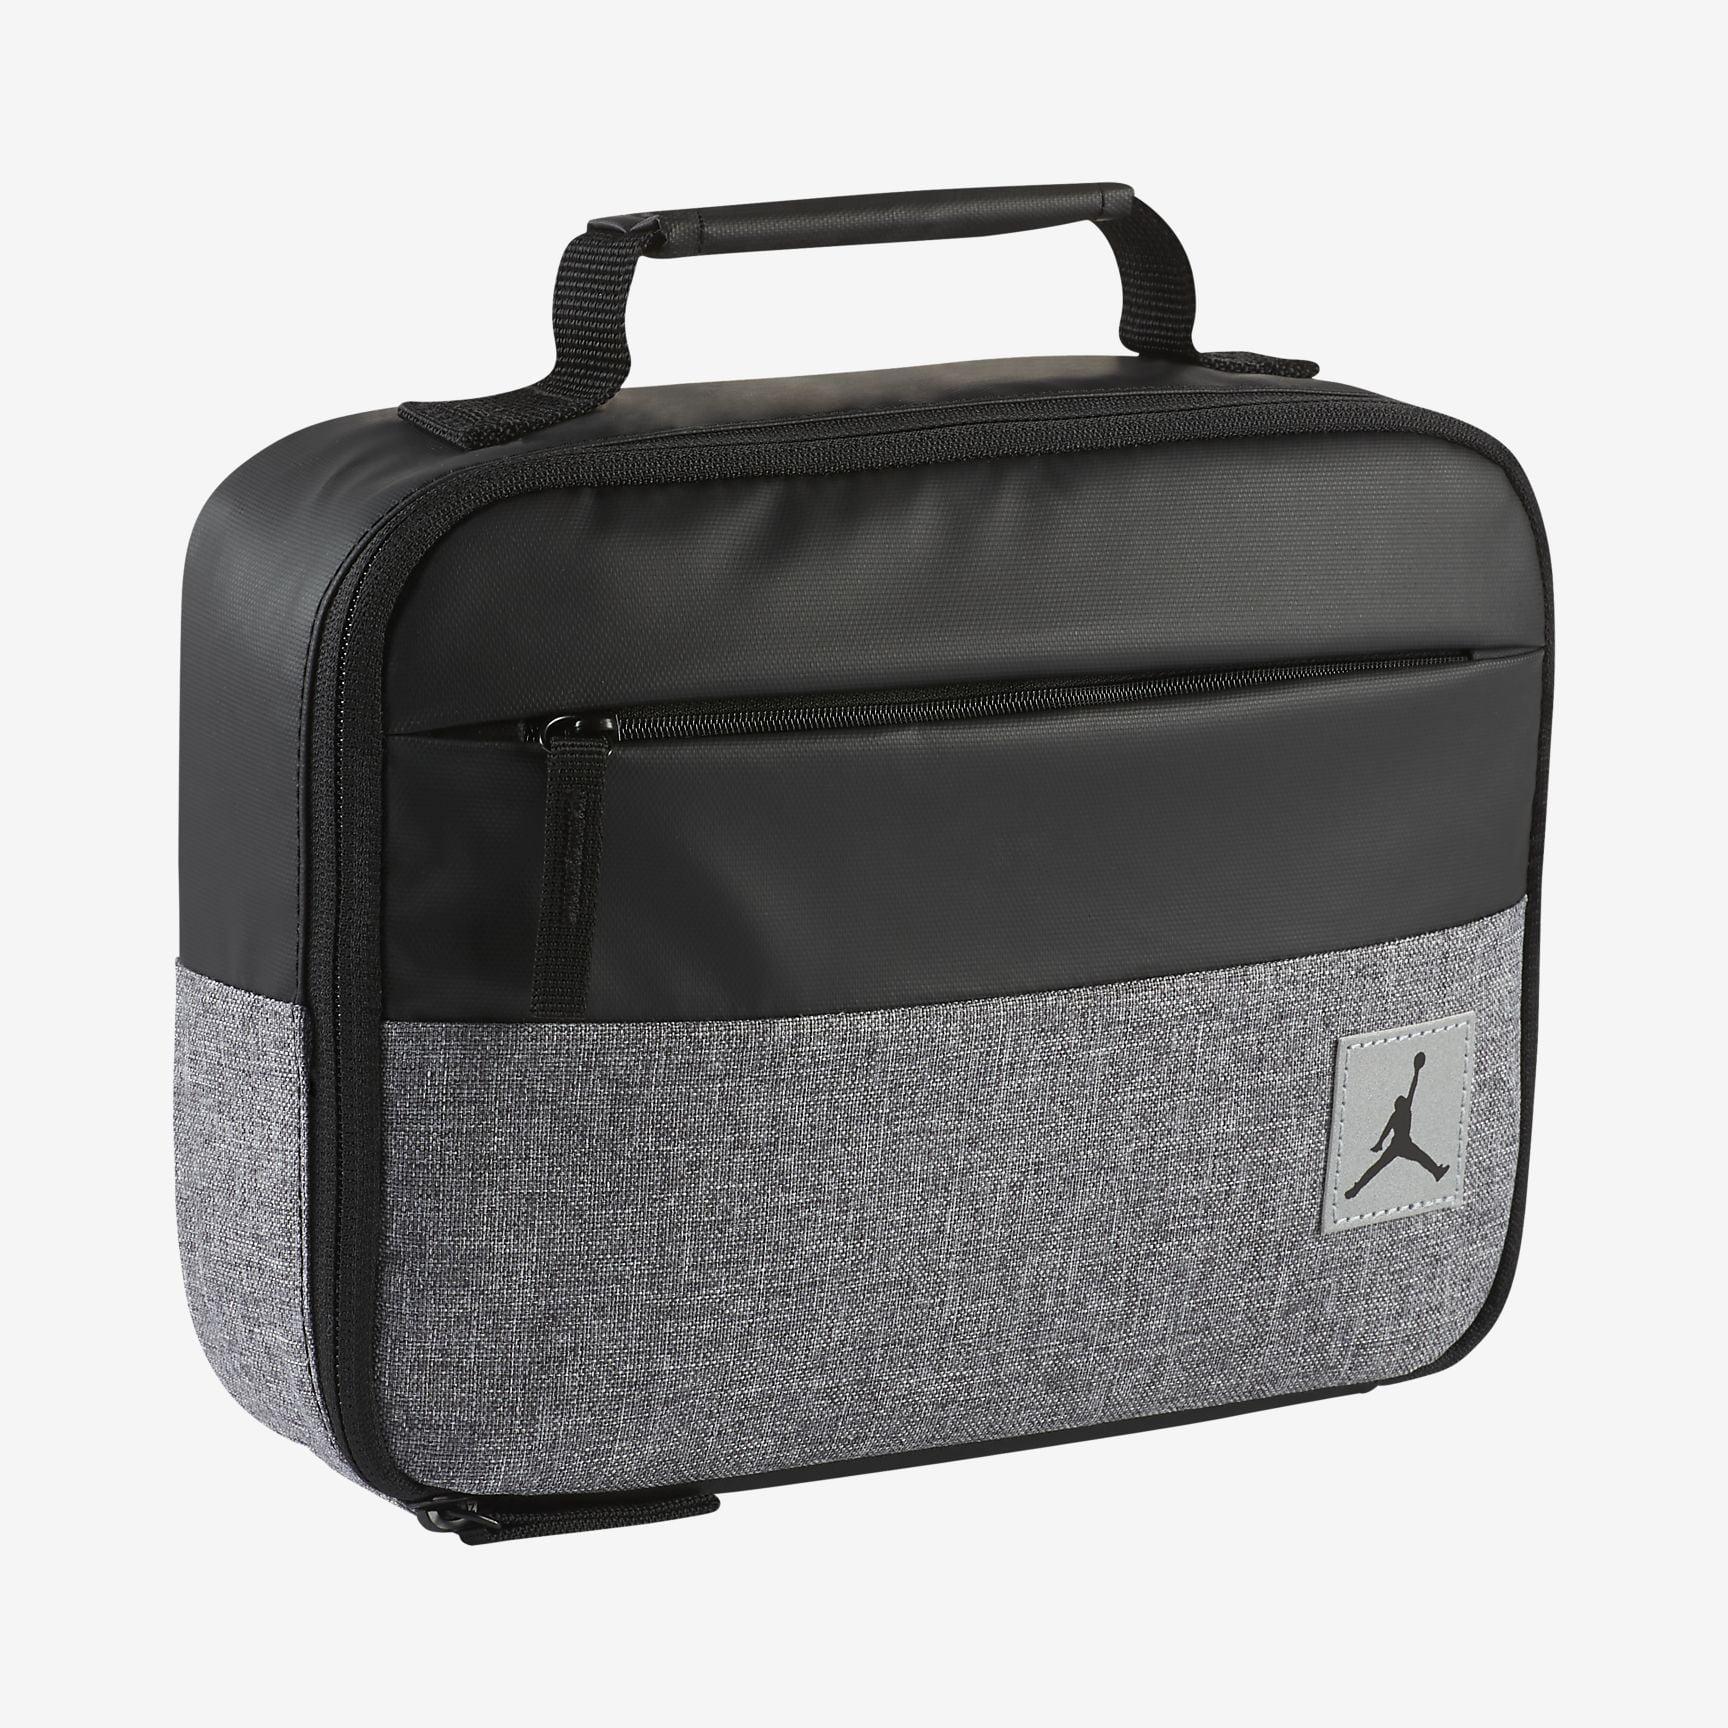 e212edc652 Nike Jordan Kids Pivot Fuel Pack Insulated Lunch Box